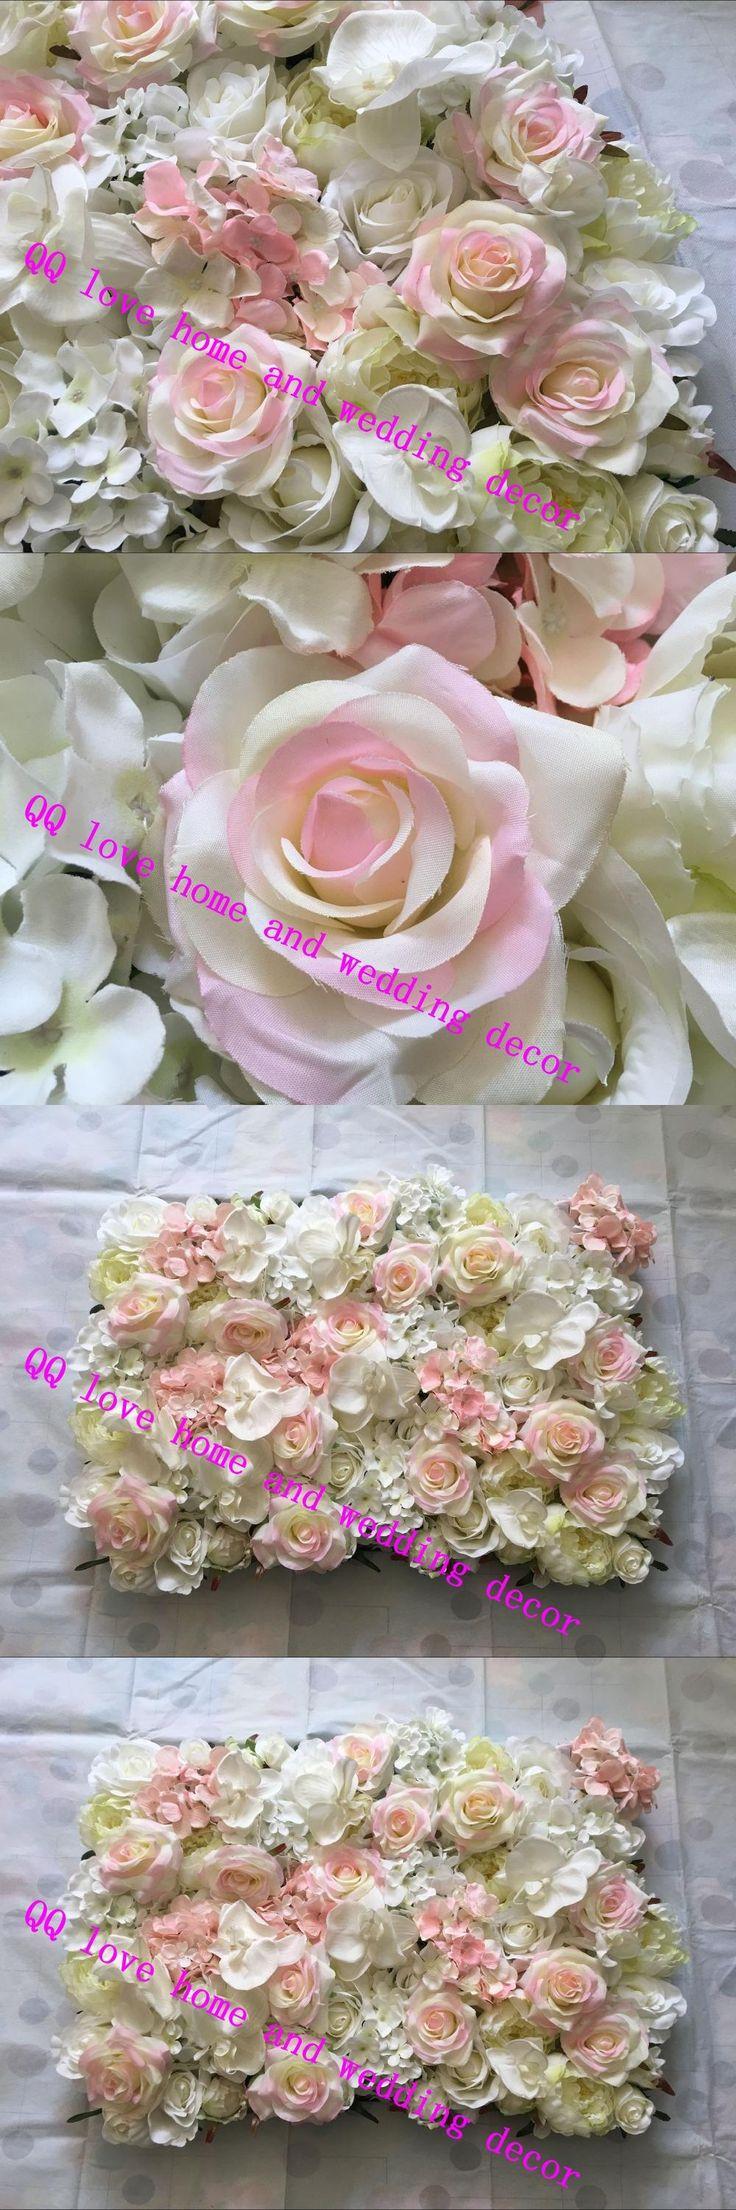 Best 25+ Flower wall wedding ideas on Pinterest | Flower backdrop, DIY  wedding wall decorations and Flower wall